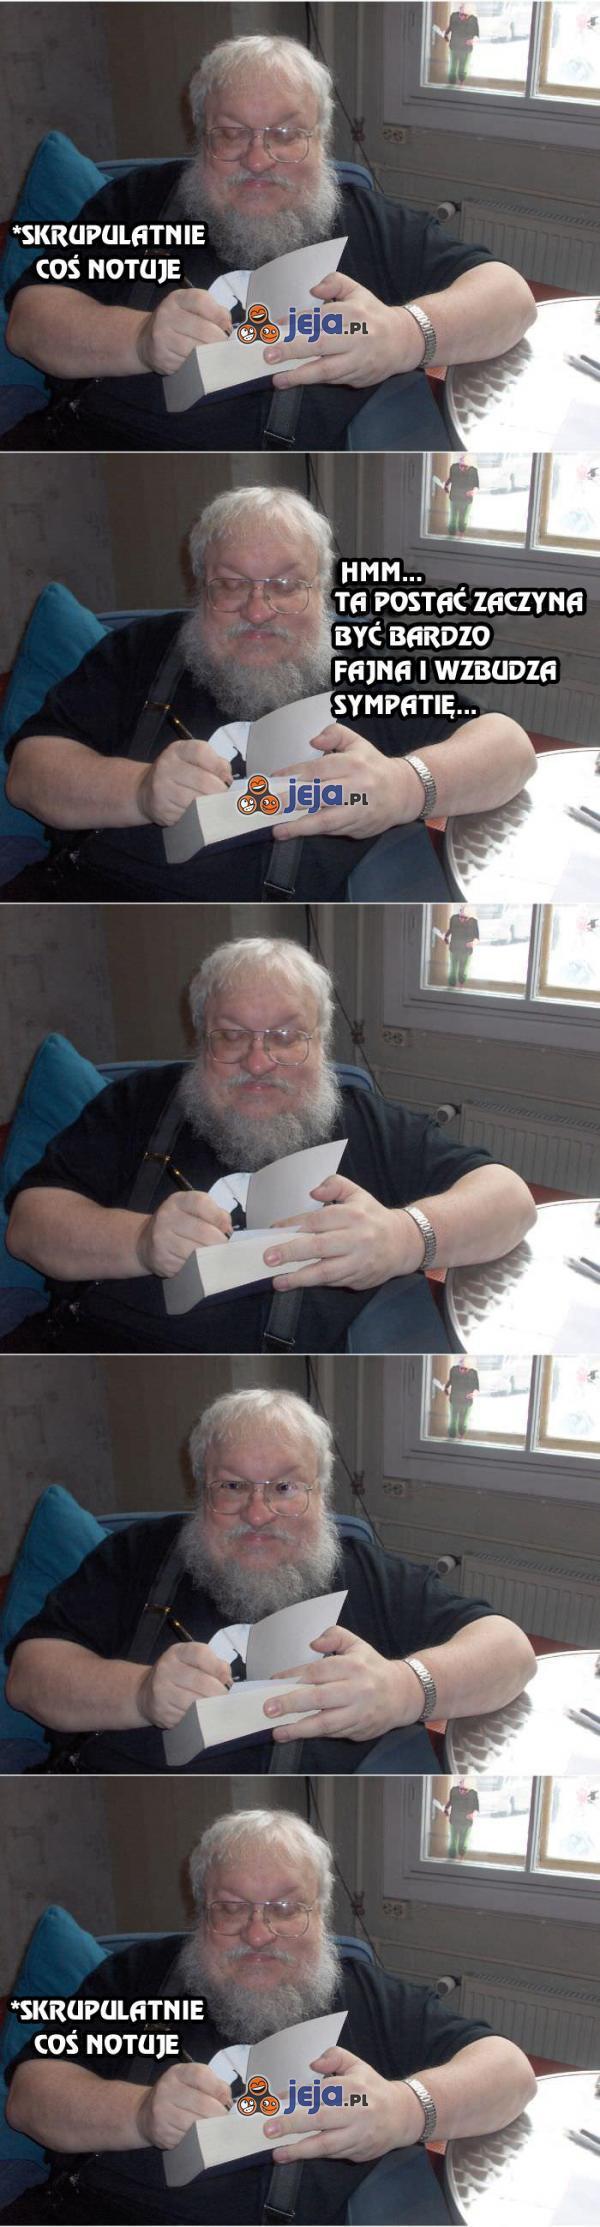 George R.R. Martin podczas pisania Gry o Tron